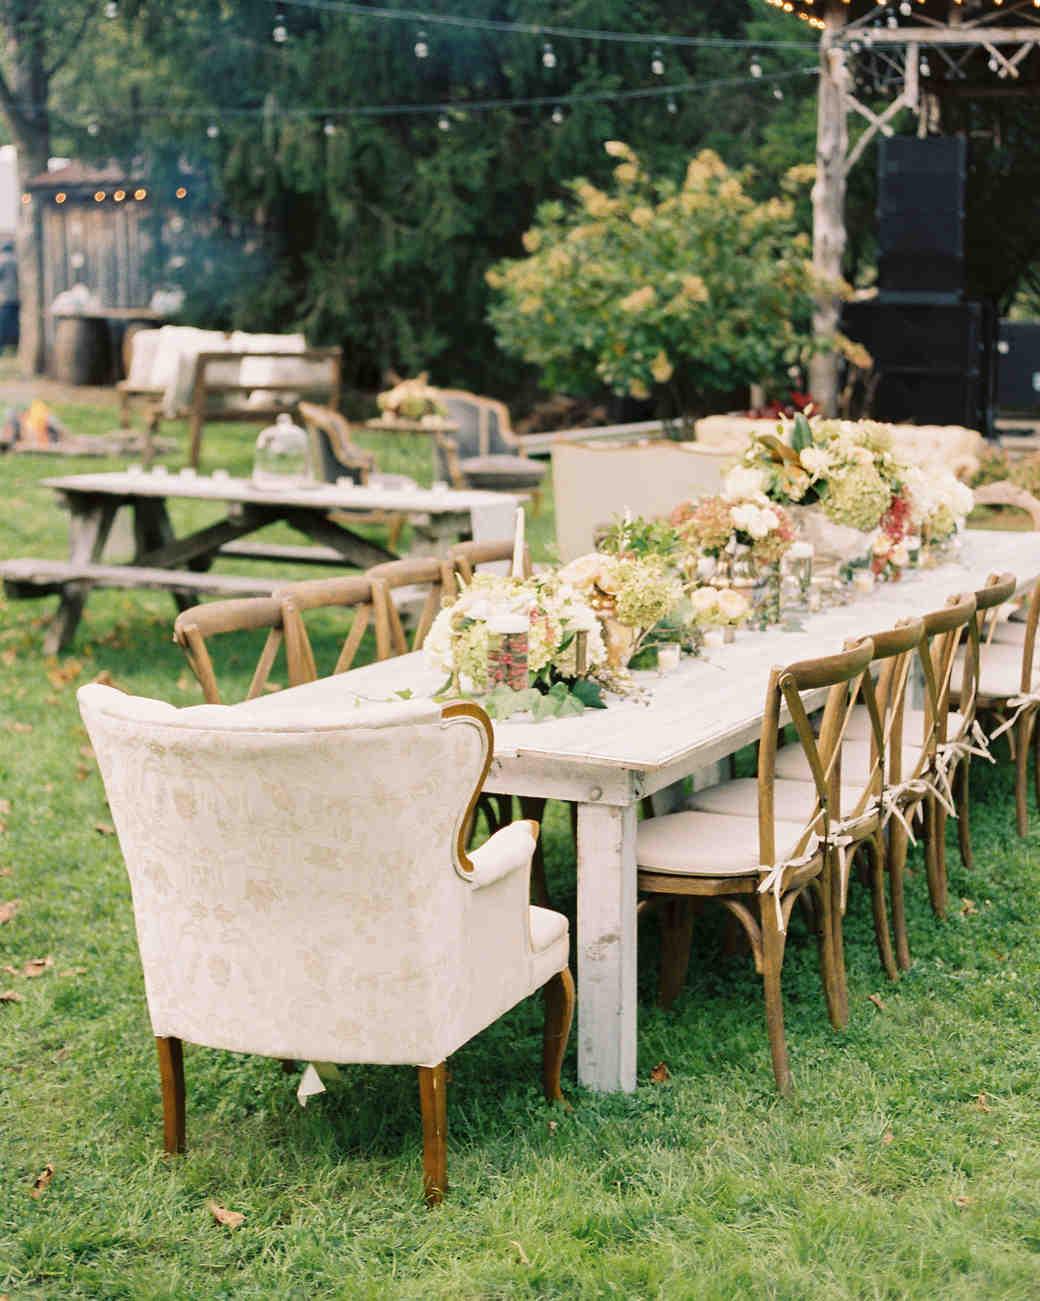 destiny-taylor-wedding-table-297-s112347-1115.jpg